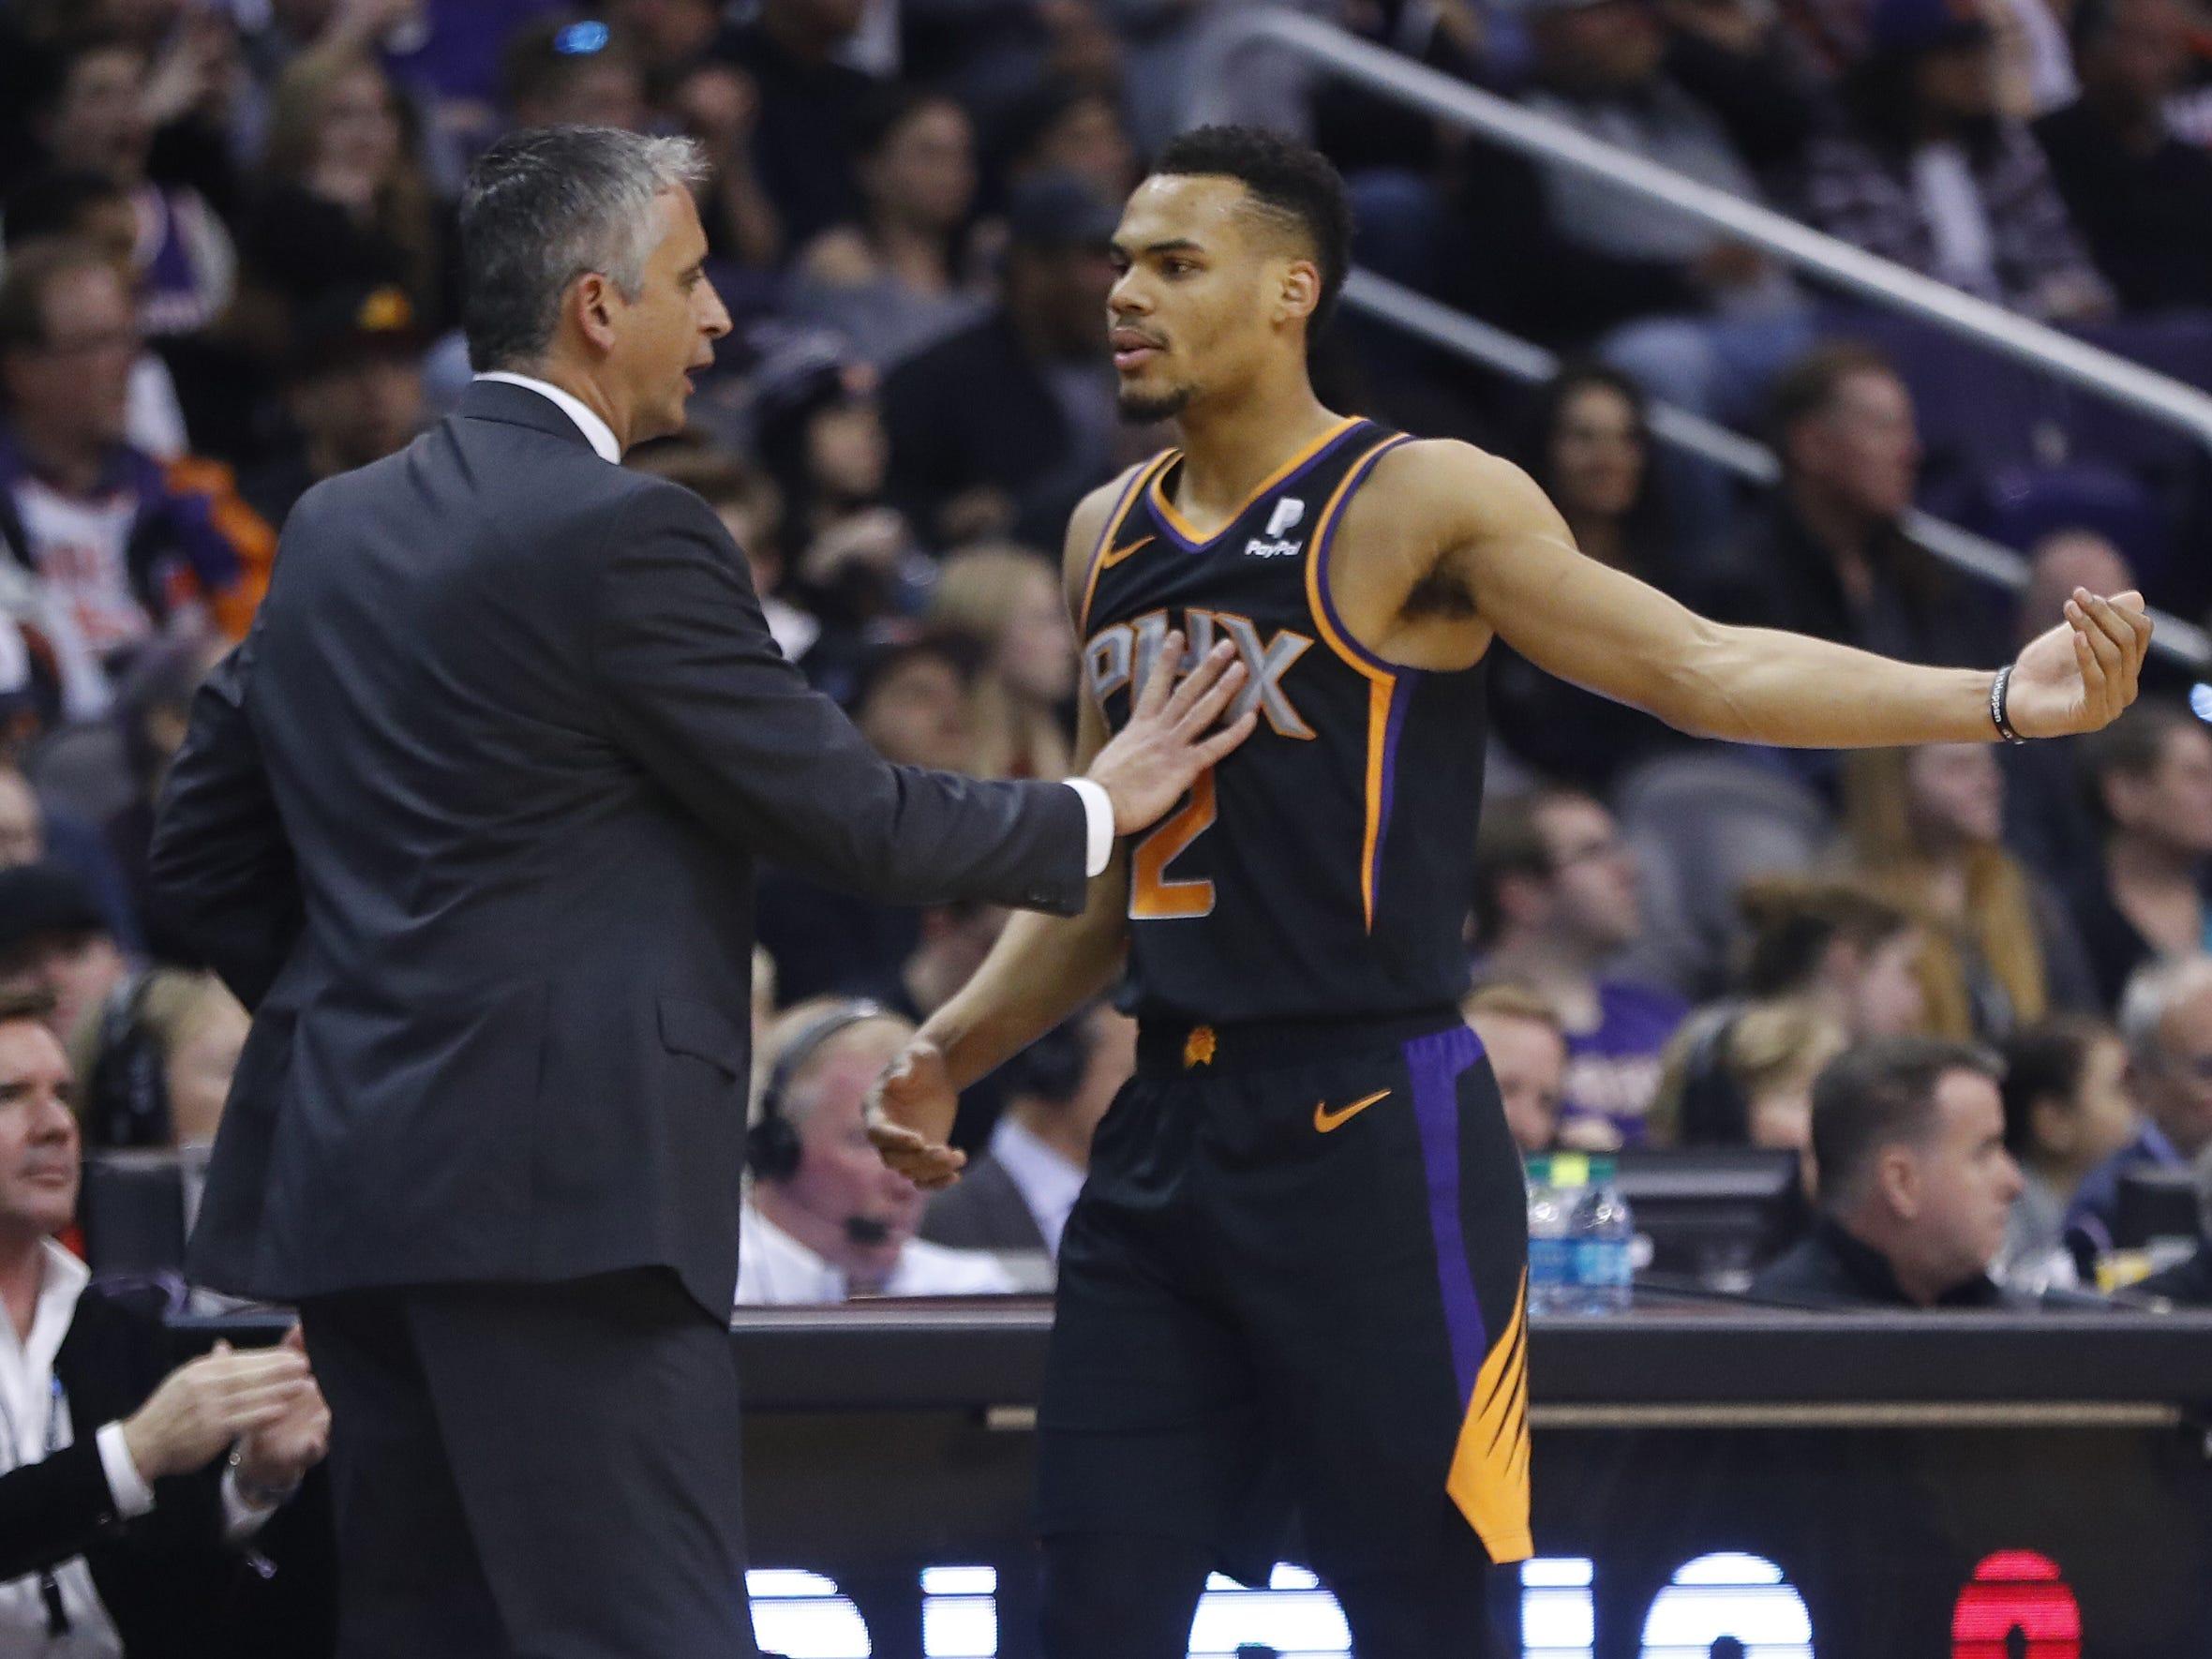 Suns' Igor Kokoskov puts his hand on Elie Okobo (2) as they talk during the second half at Talking Stick Resort Arena in Phoenix, Ariz. on January 4, 2019.